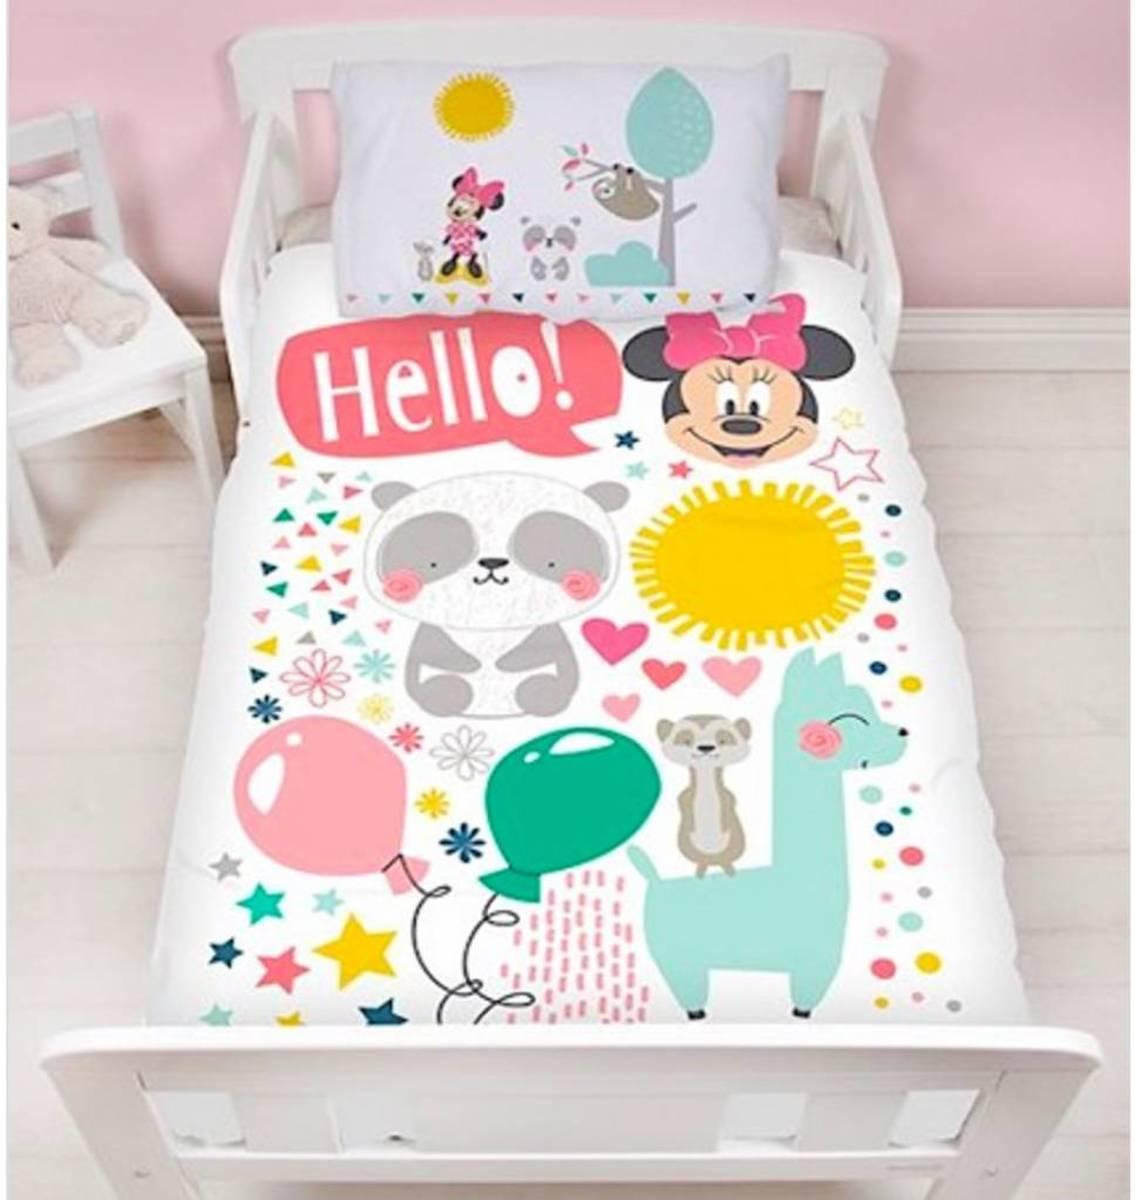 Disney Minnie Mouse Friends junior - Dekbedovertrek - 120 x 150 cm - Multi kopen